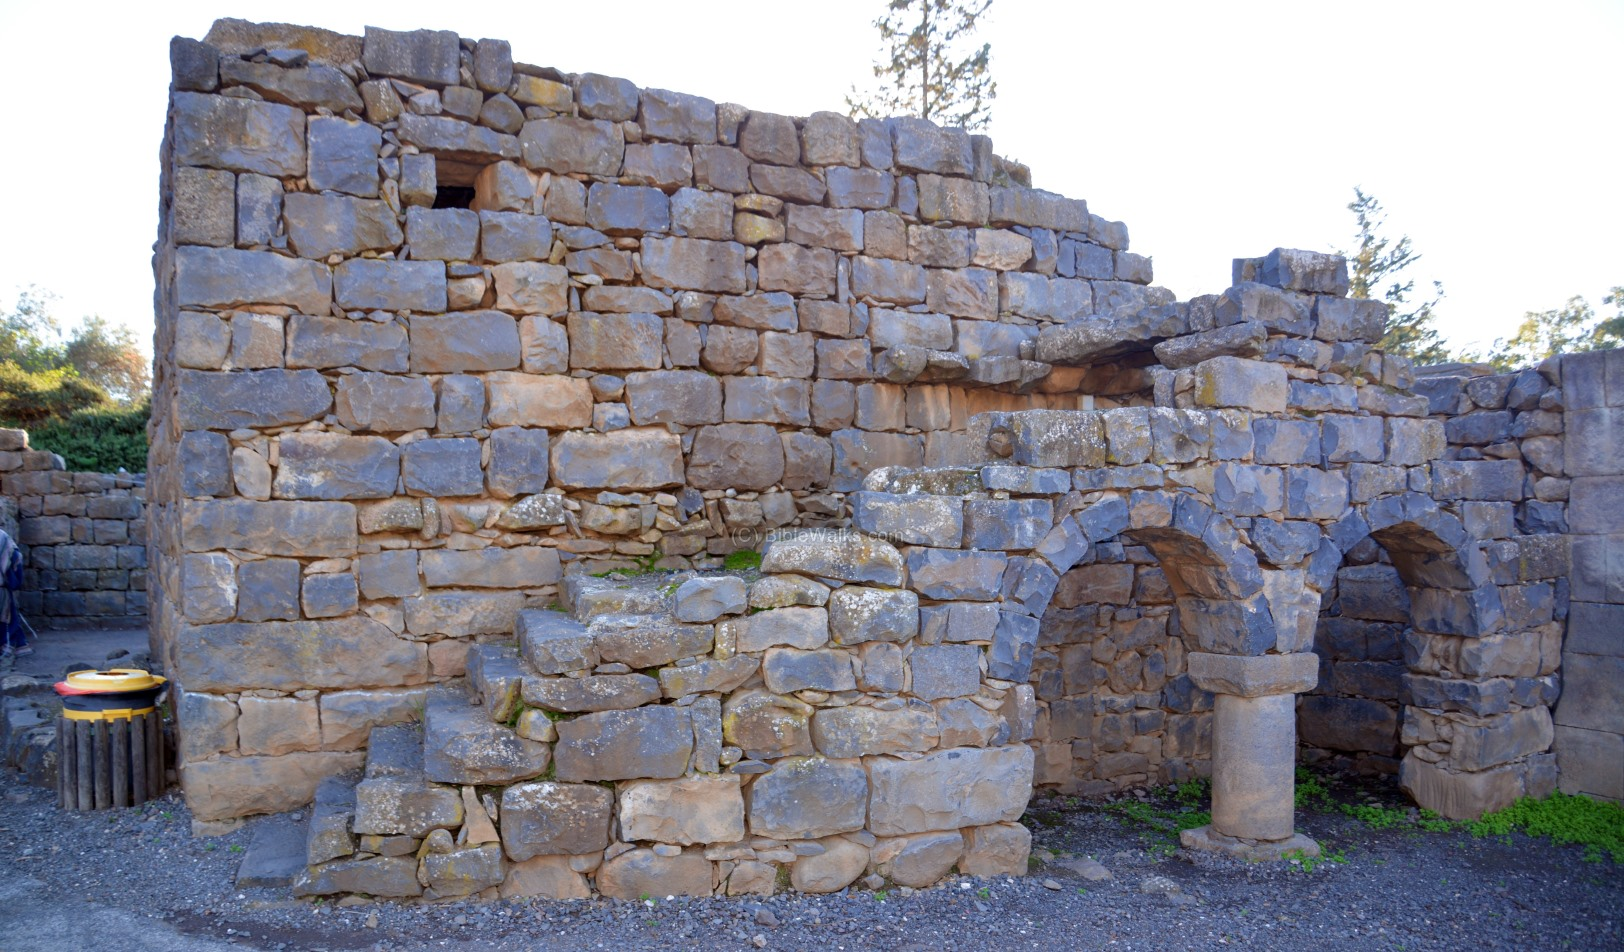 A restored stone house in the Talmudic village in Katzrin. Photo via BibleWalks.com